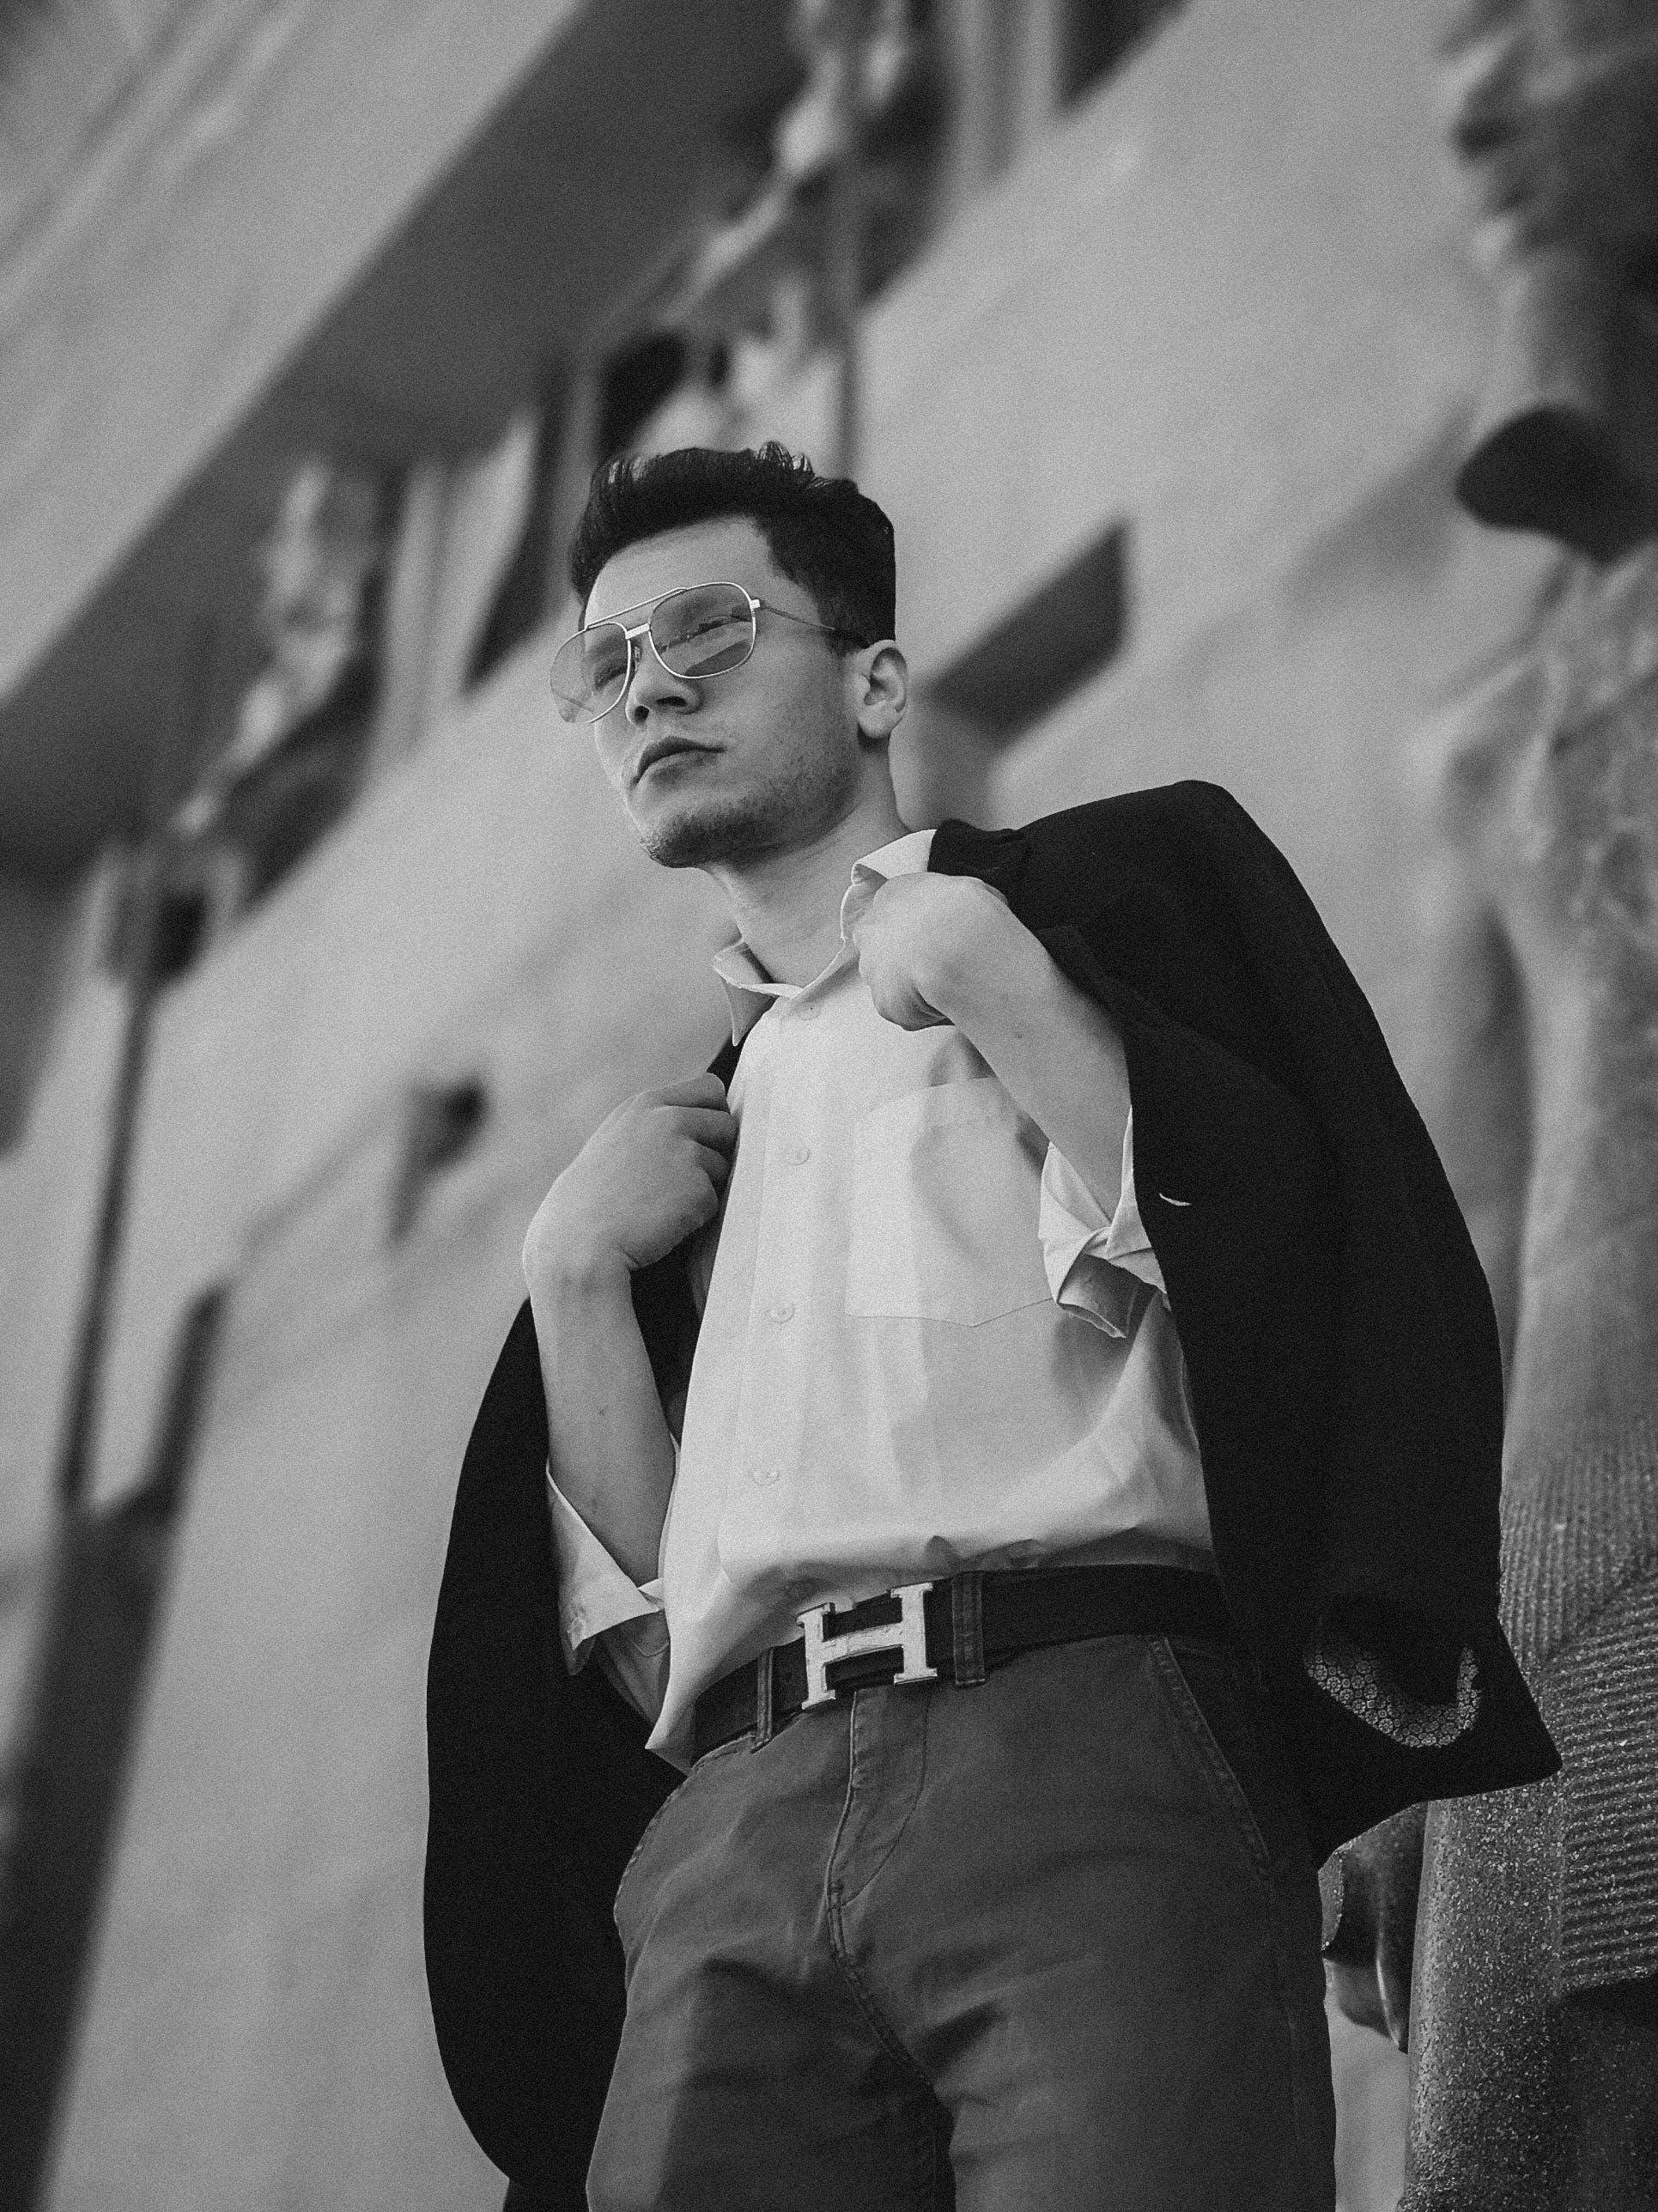 Monochrome Photo Of Man Wearing Sunglasses